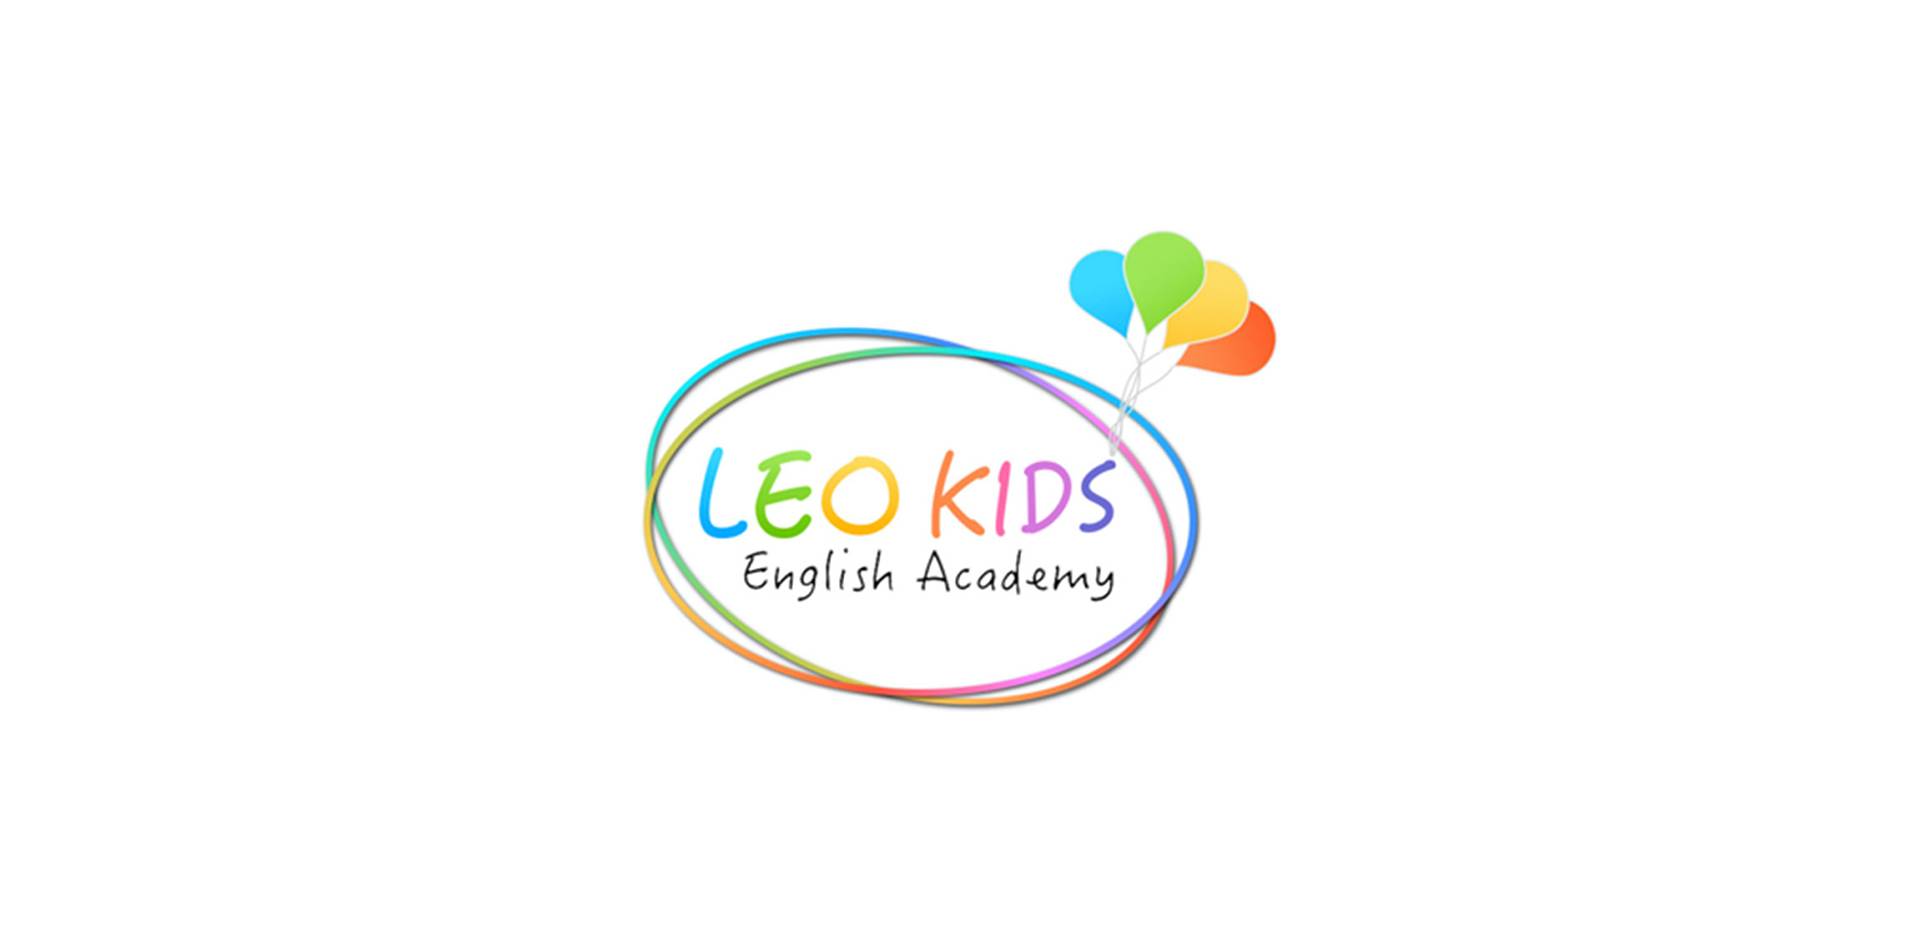 leokids